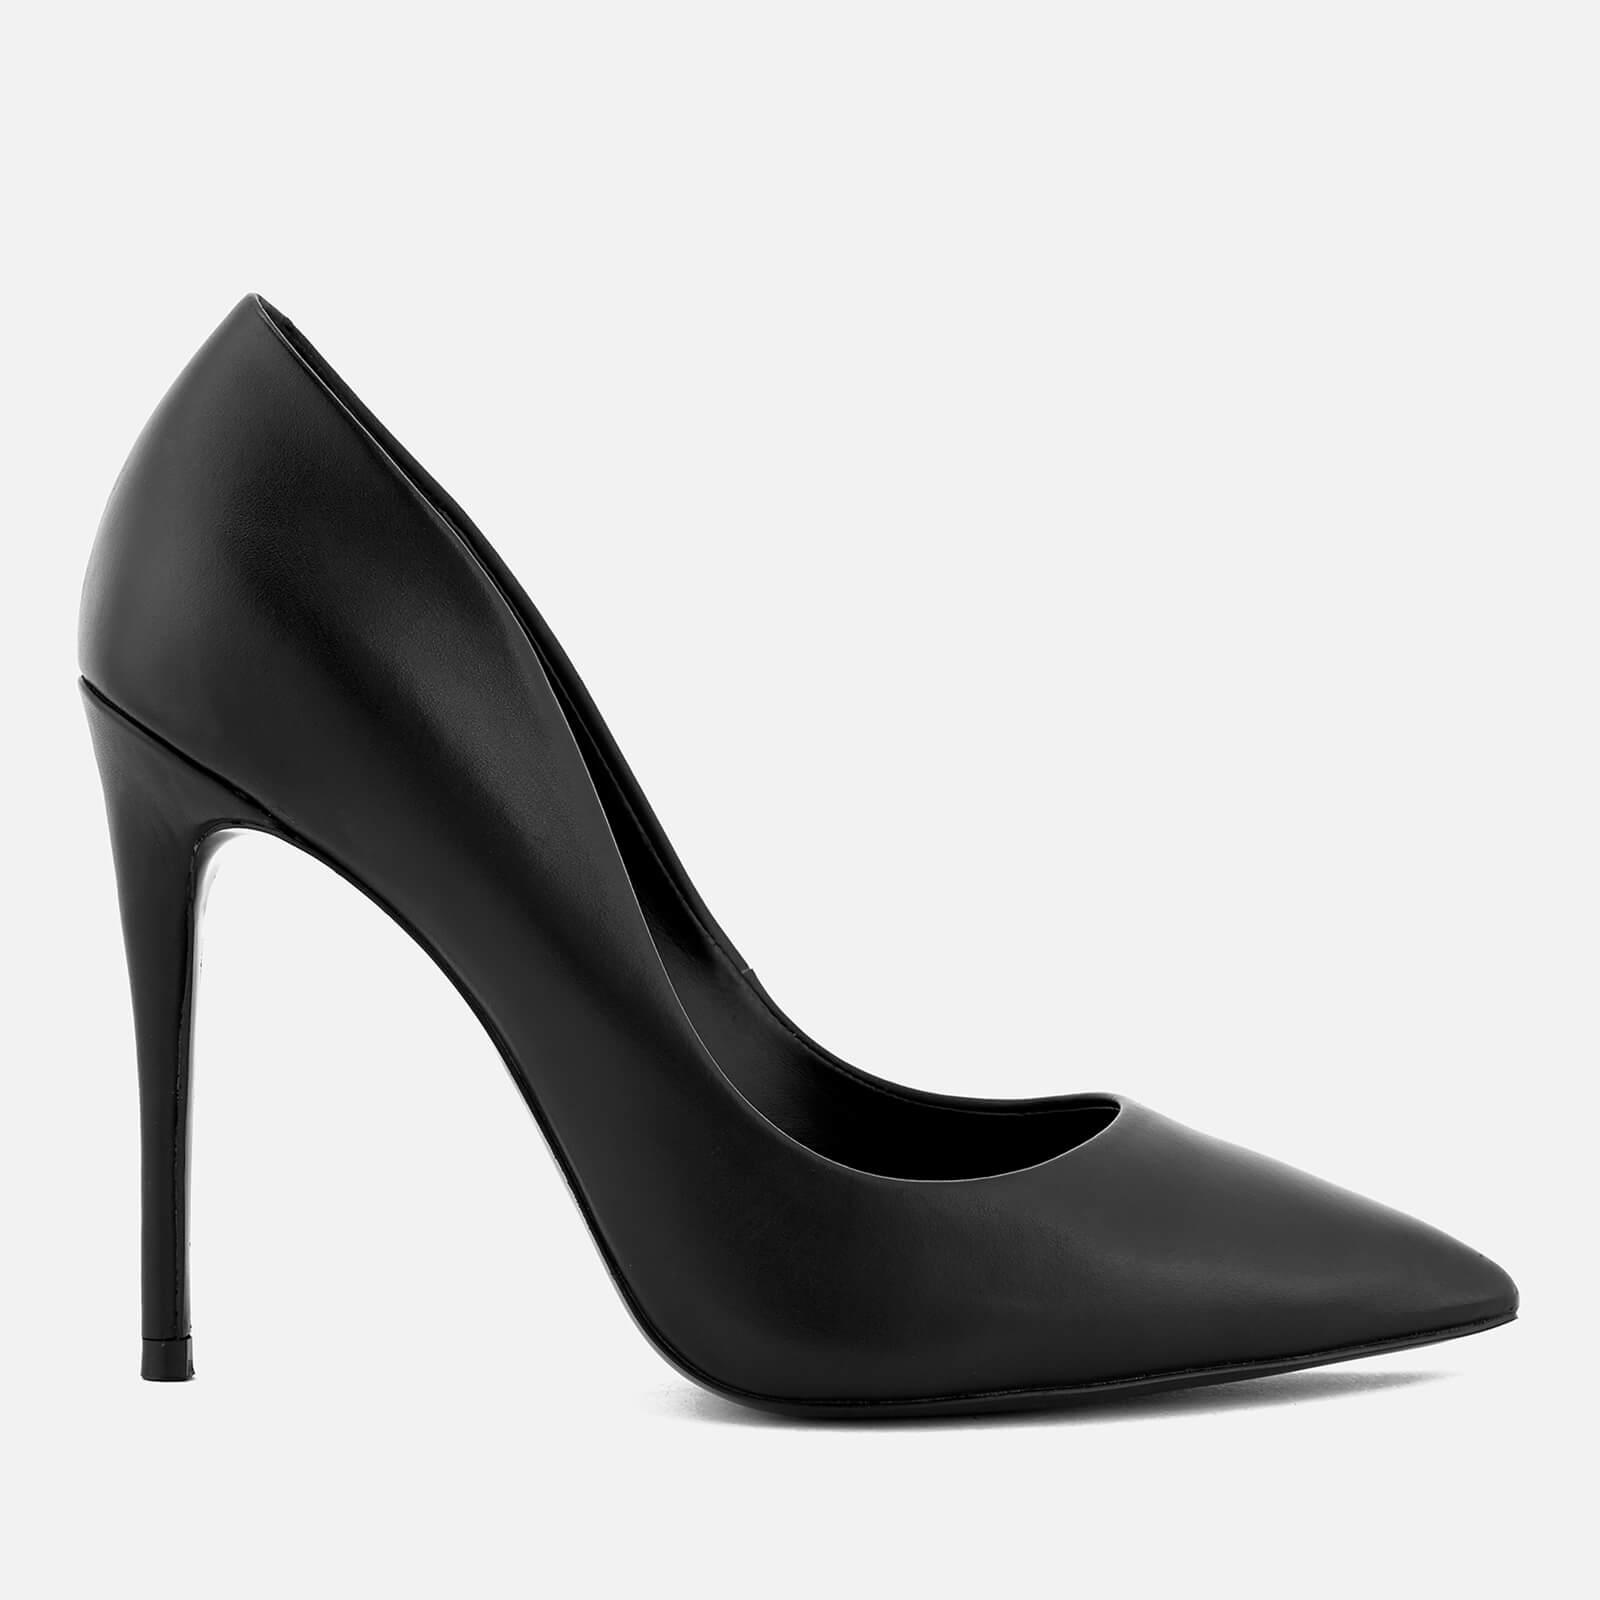 Steve Madden Women's Daisie Leather Court Shoes - Black - UK 6 - Black